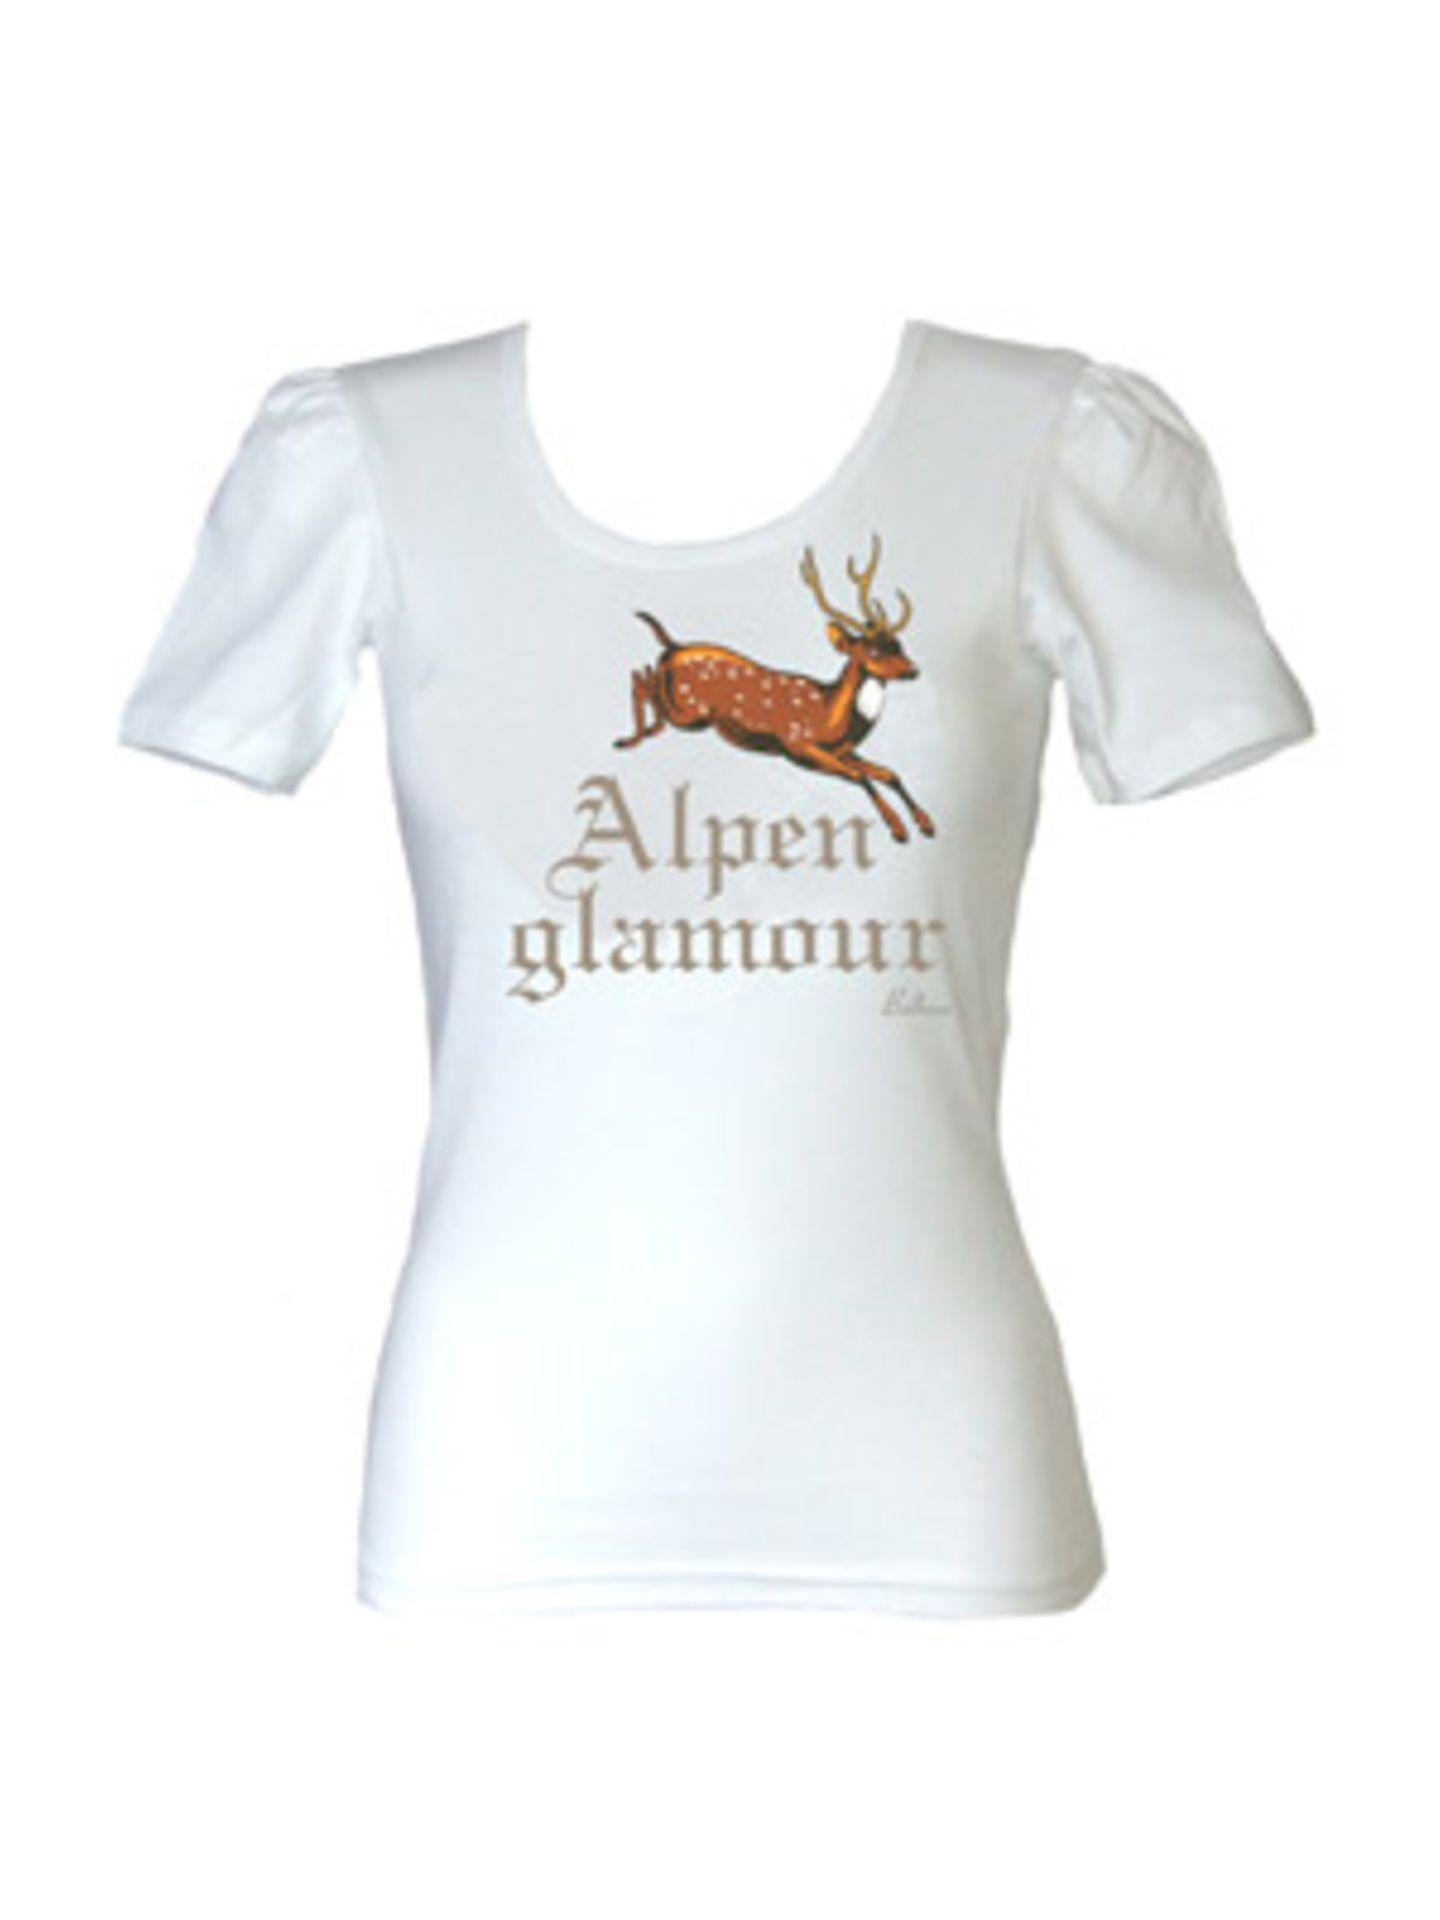 """Alpenglamour""-T-Shirt von Balbina, ca. 40 Euro. Über www.balbina-balbina.de."